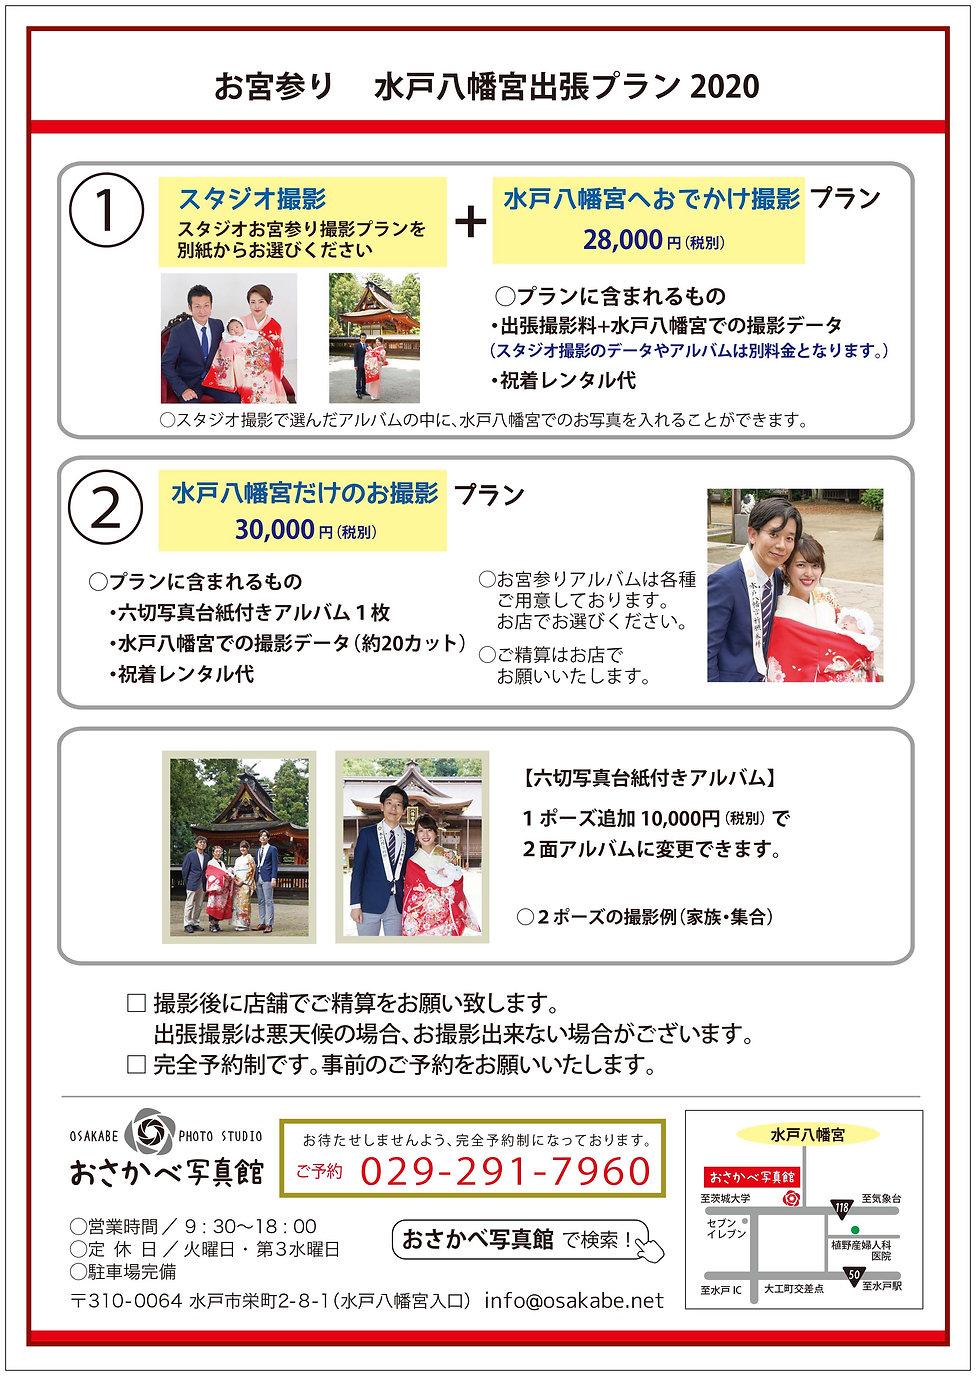 omiya_hachimangu_plan.jpg